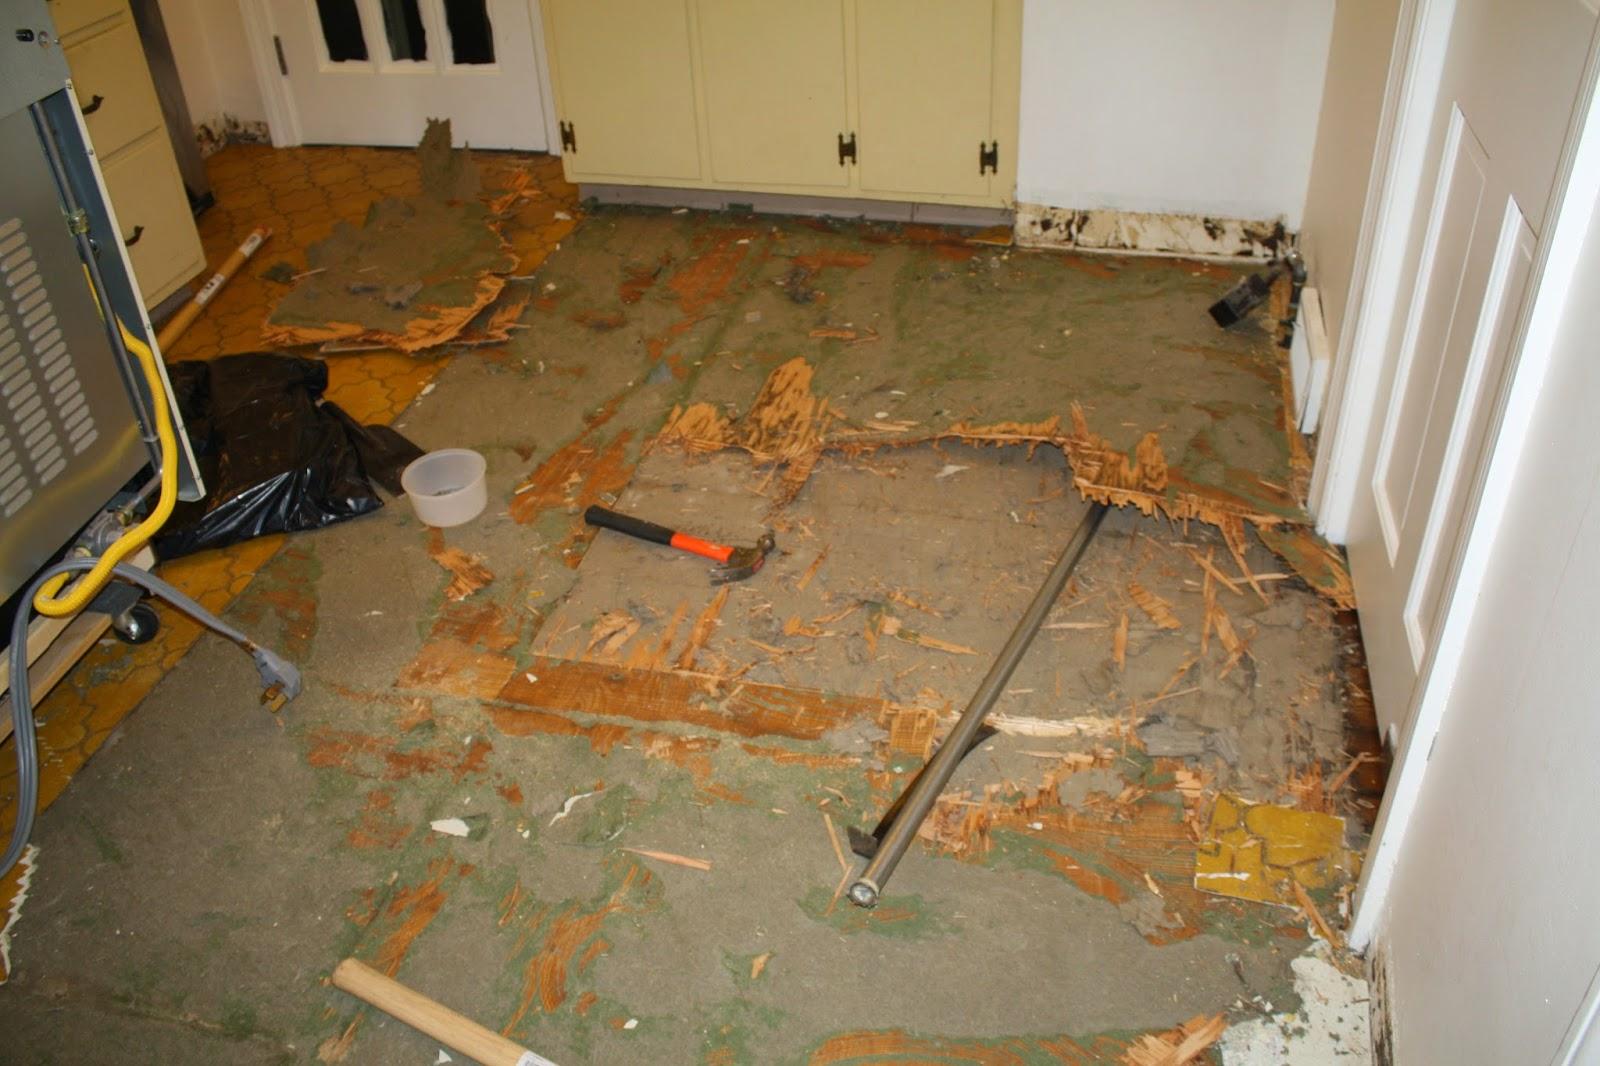 Removing Linoleum - Scraping Up Linoleum - Restoring Wood Floors - Ripping Up Linoleum - Removing Black Tar from Wood Floors